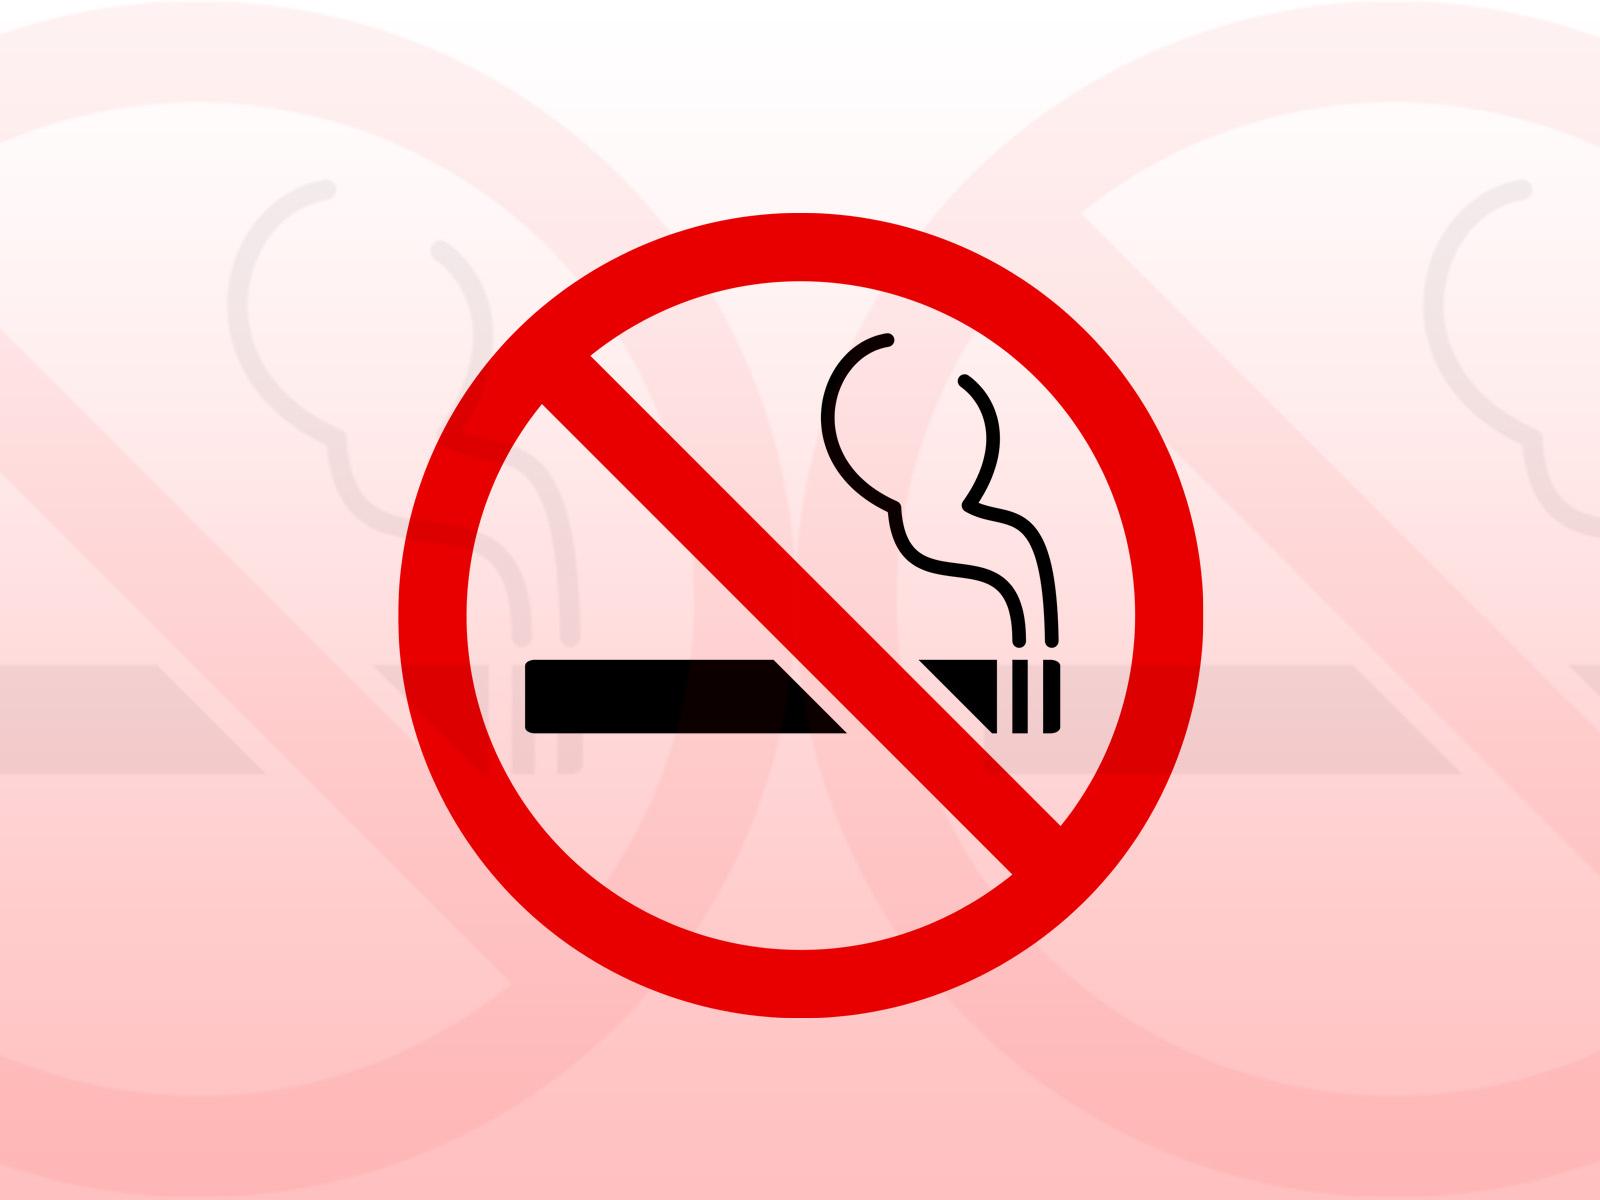 no smoking sign backgrounds design health templates